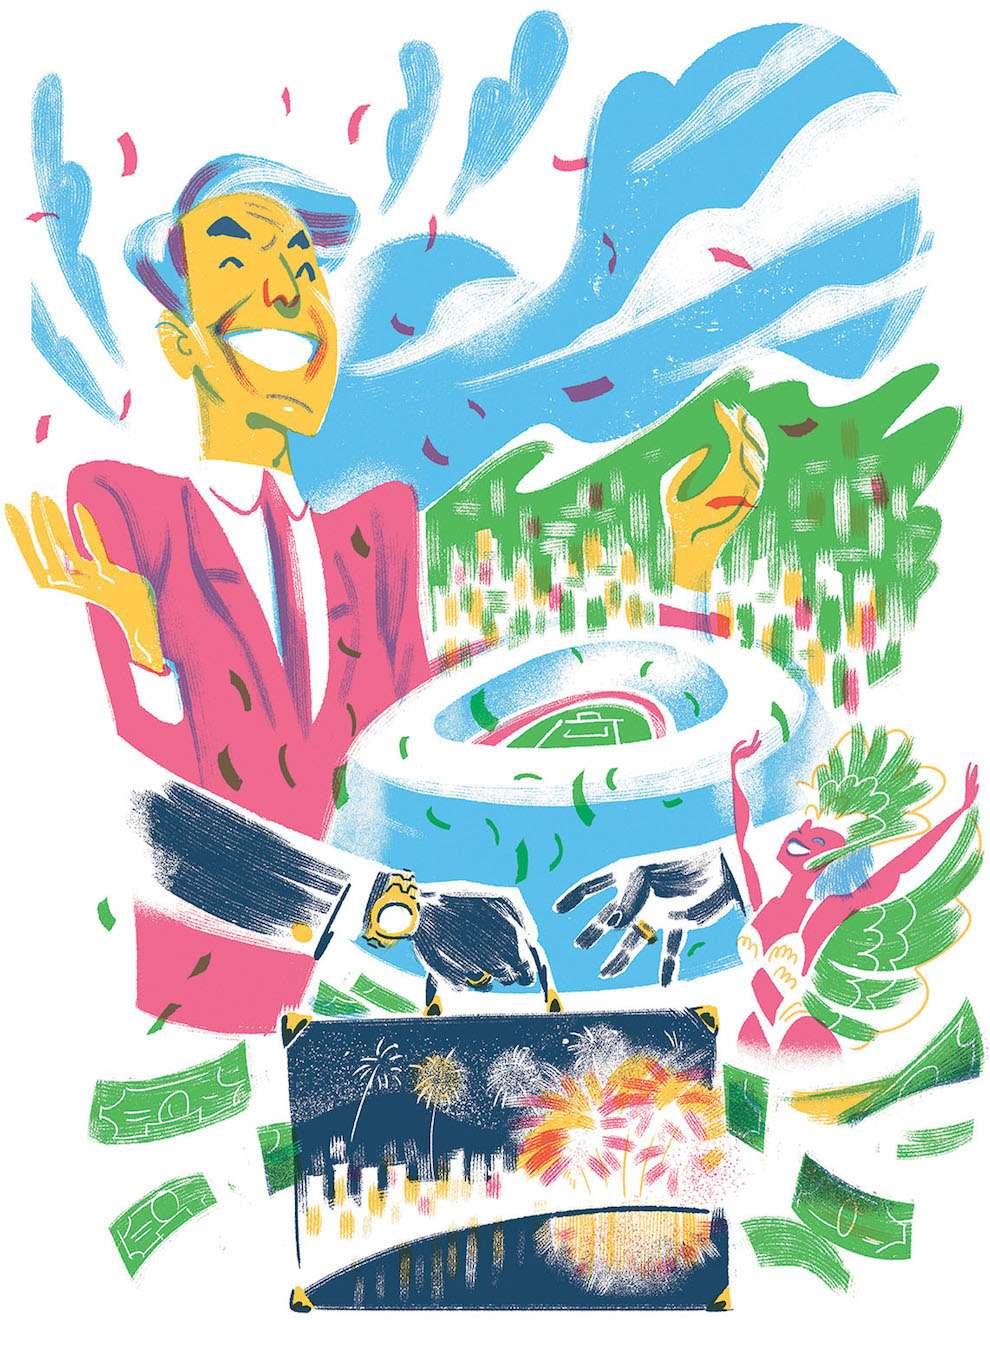 Jan Bielecki, Conceptual digital textural illustration of a man celebrating a money transaction in Rio de Jainero